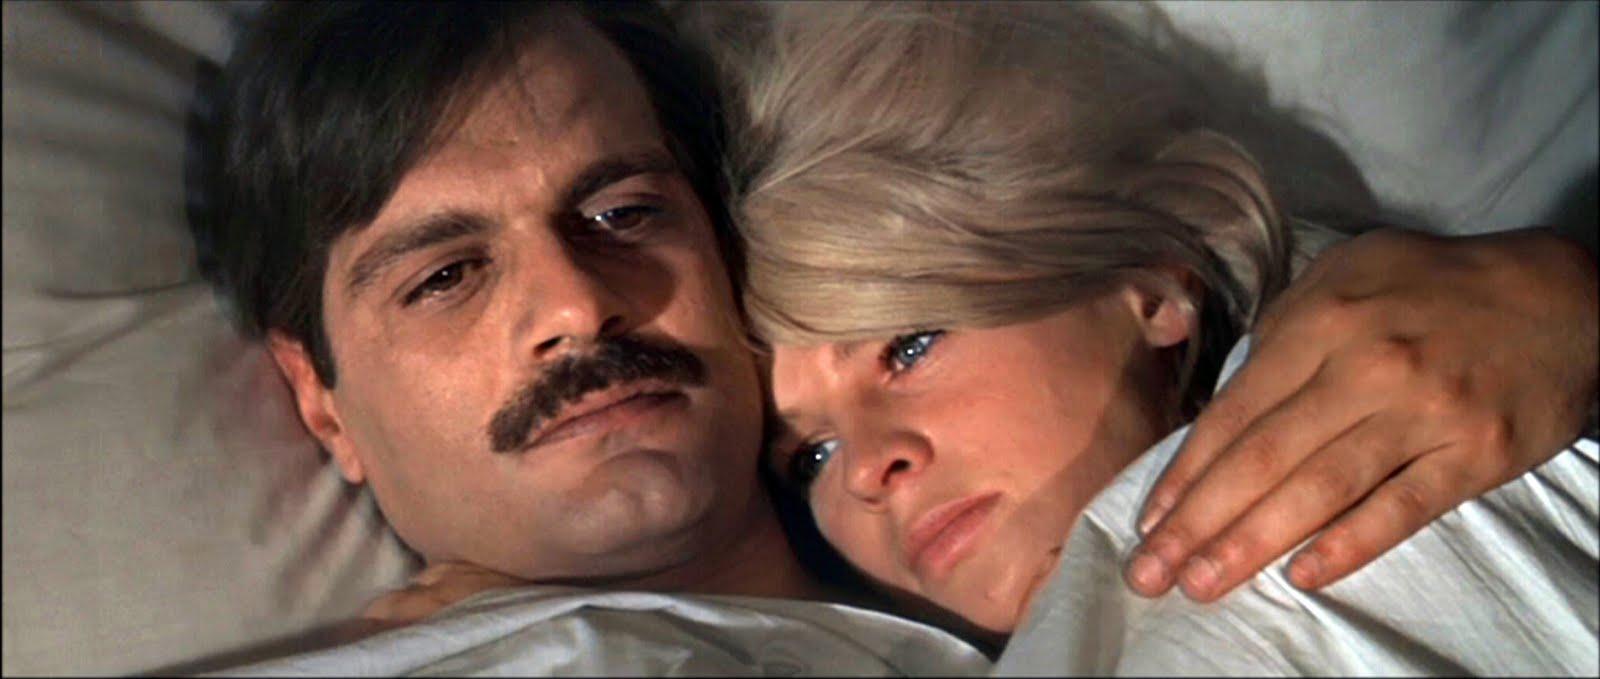 Trailer-Doctor Zhivago-Yuri Zhivago and Lara.JPG